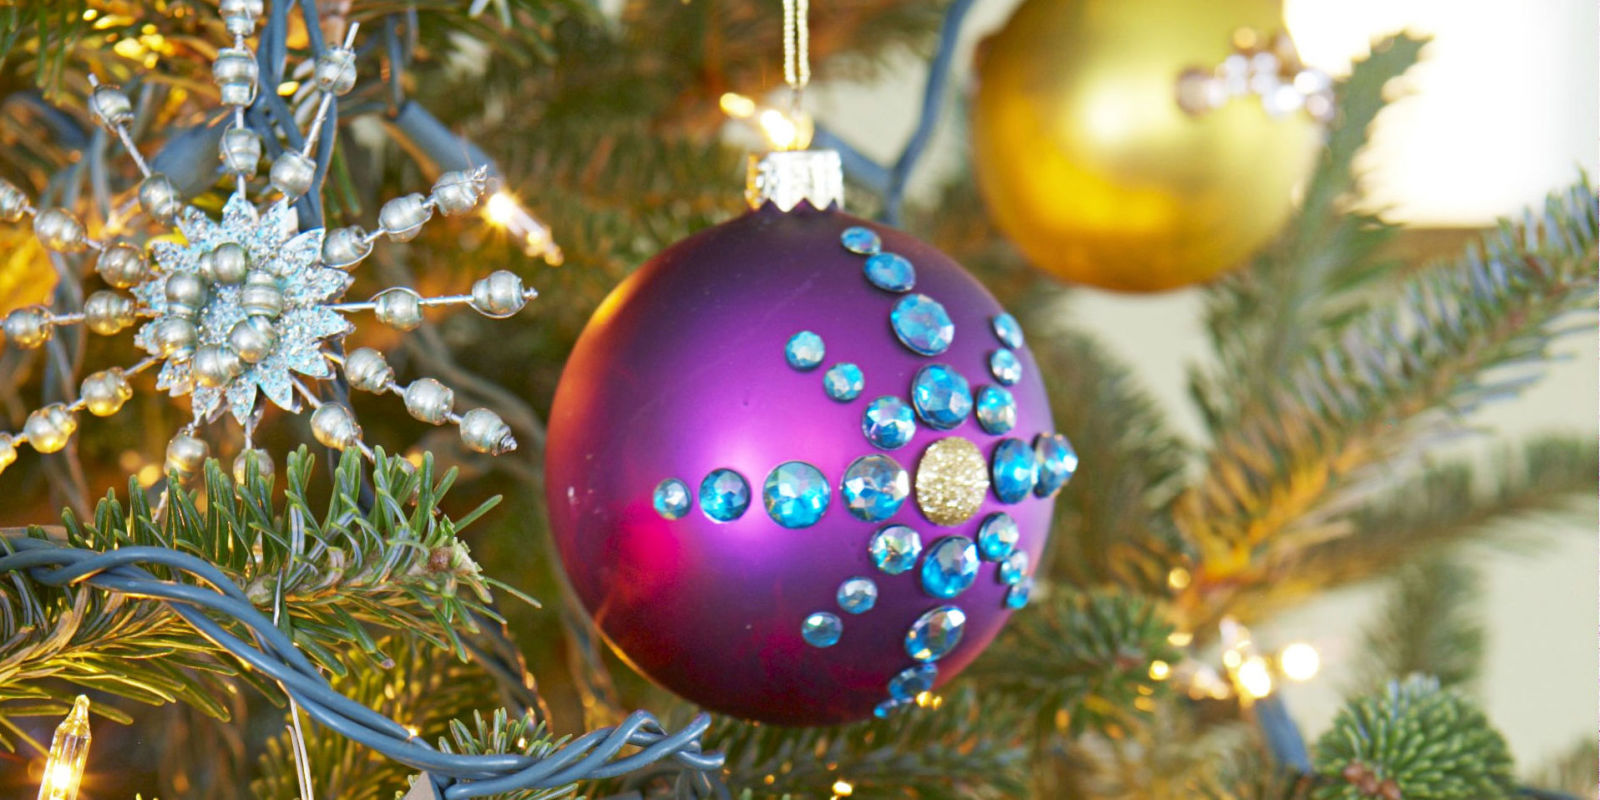 52 homemade christmas ornaments diy handmade holiday tree ornament craft ideas - Ornaments For Christmas Tree